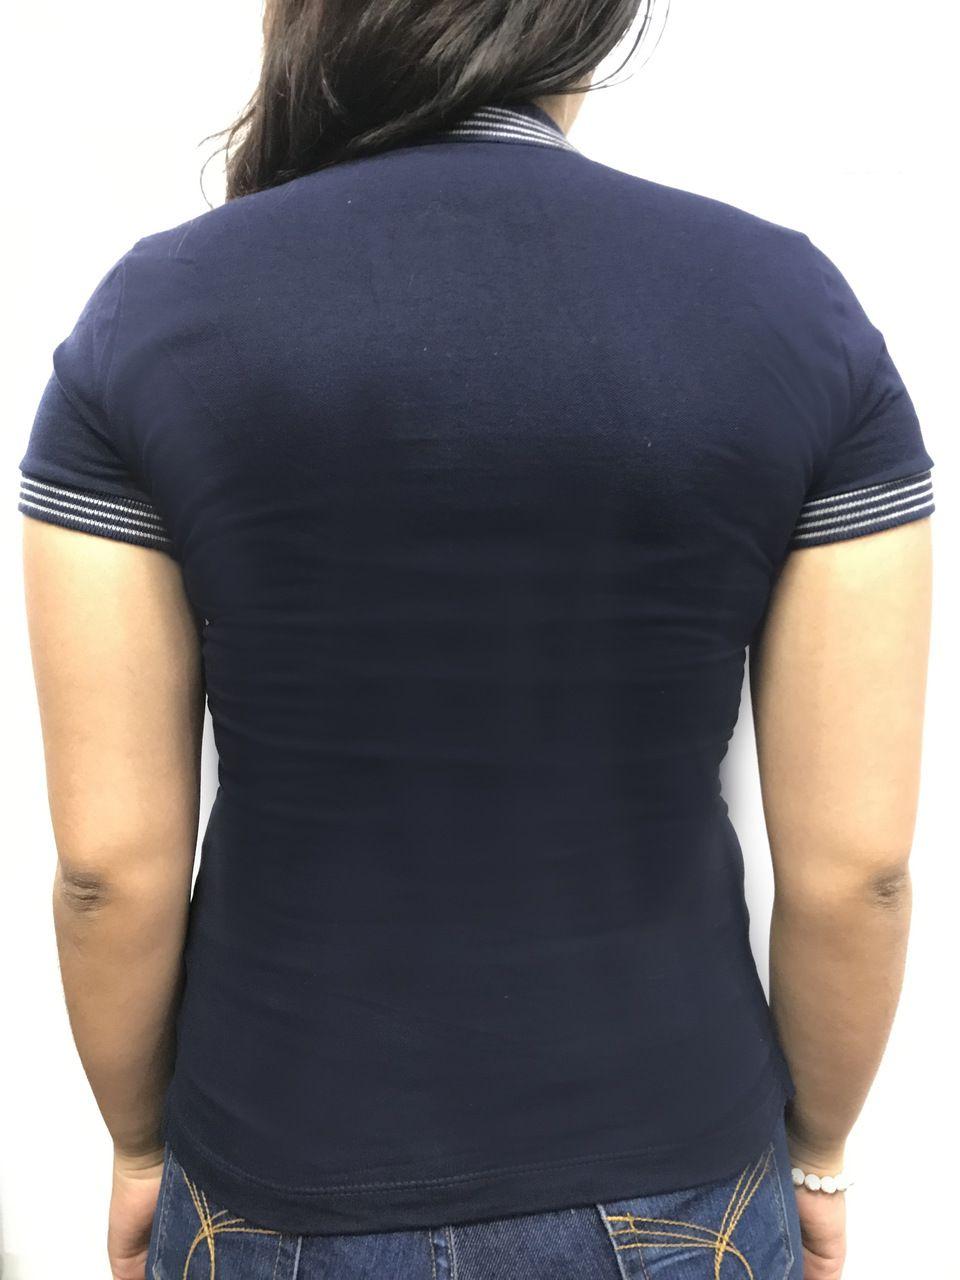 Camisa Polo Confort Feminina  - Boutique Mangalarga